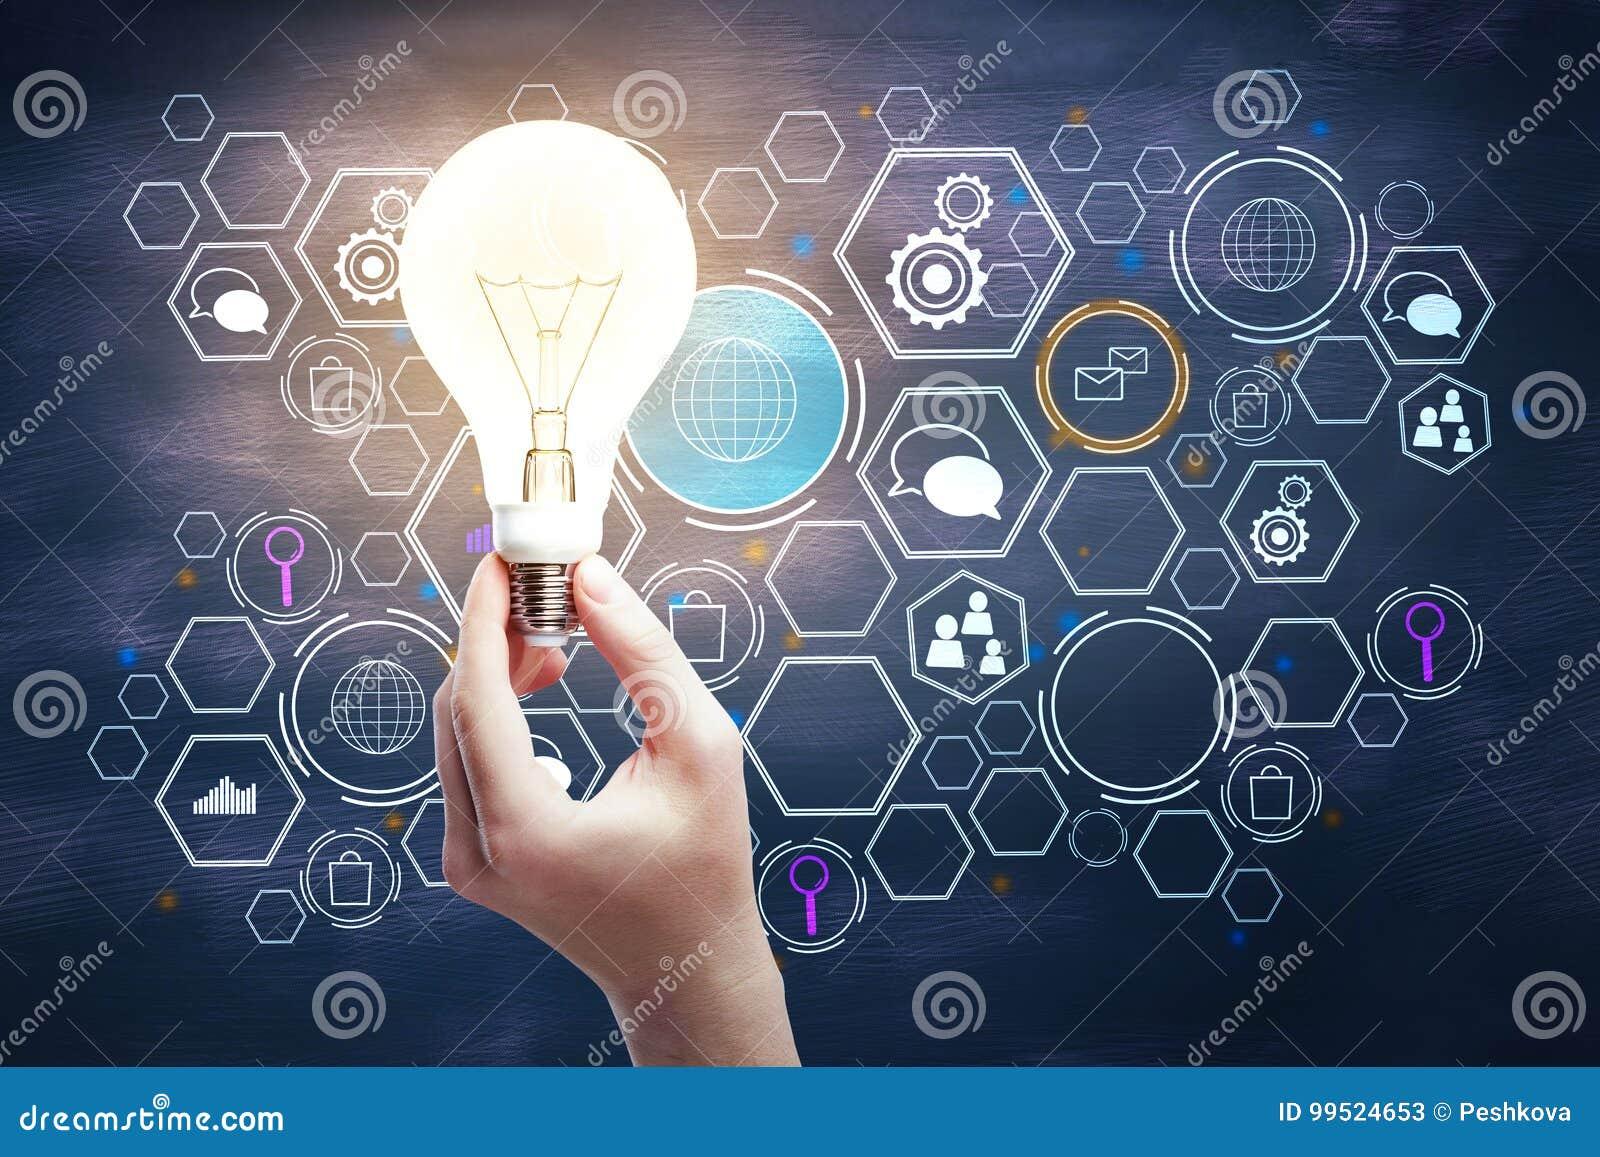 Global innovation concept